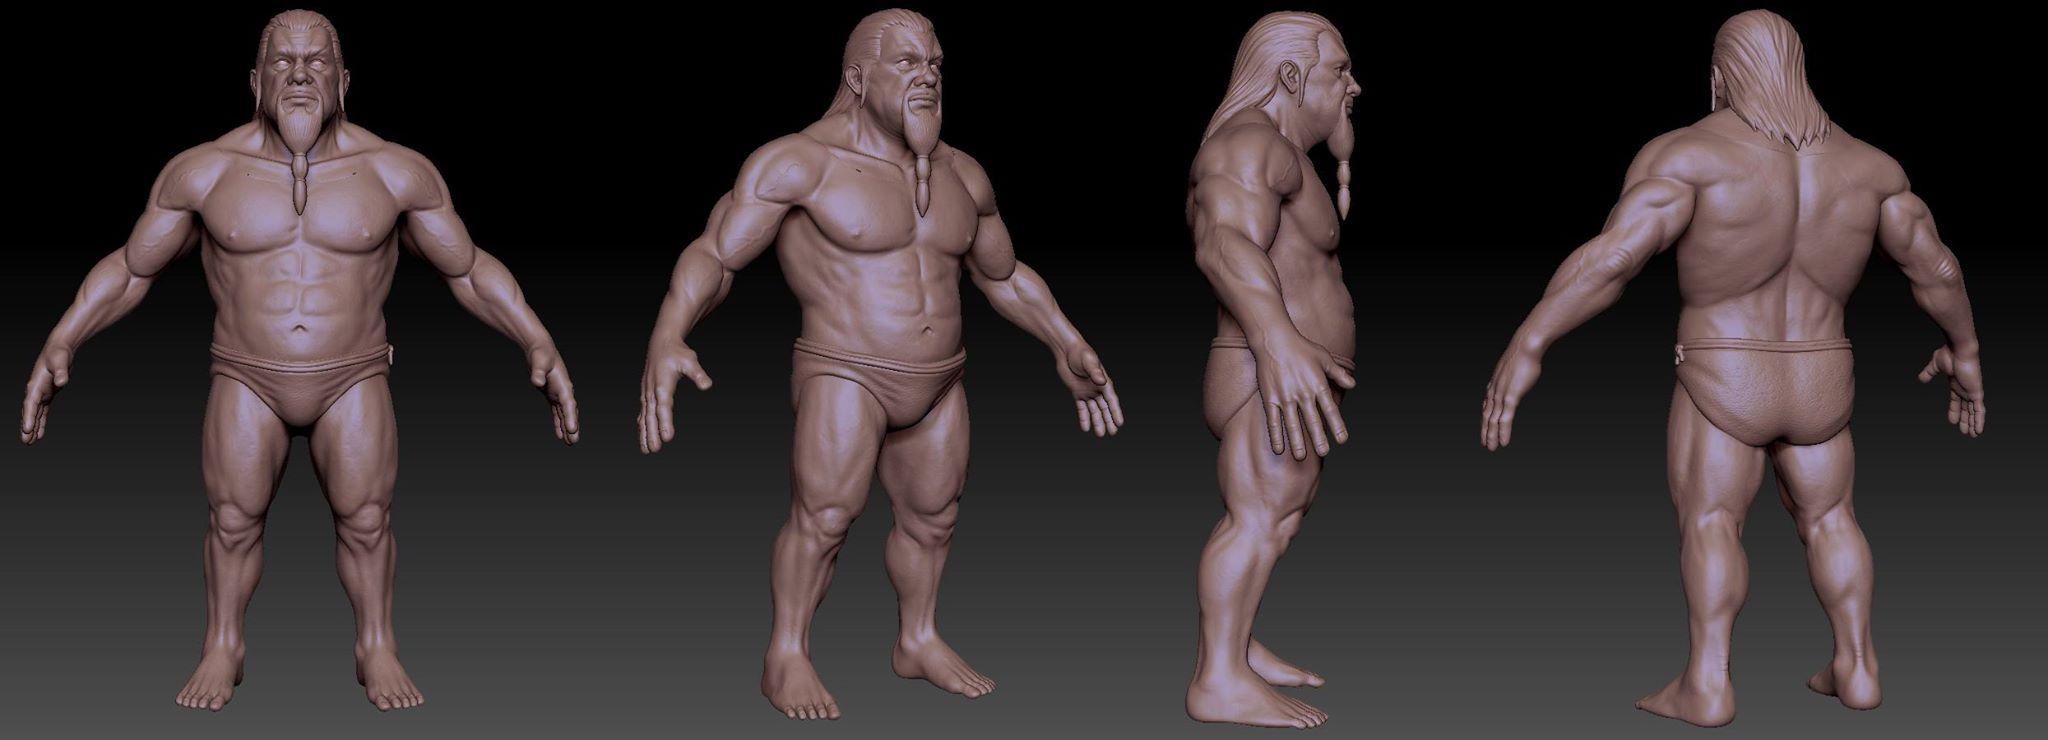 Nude Dwarfs 22